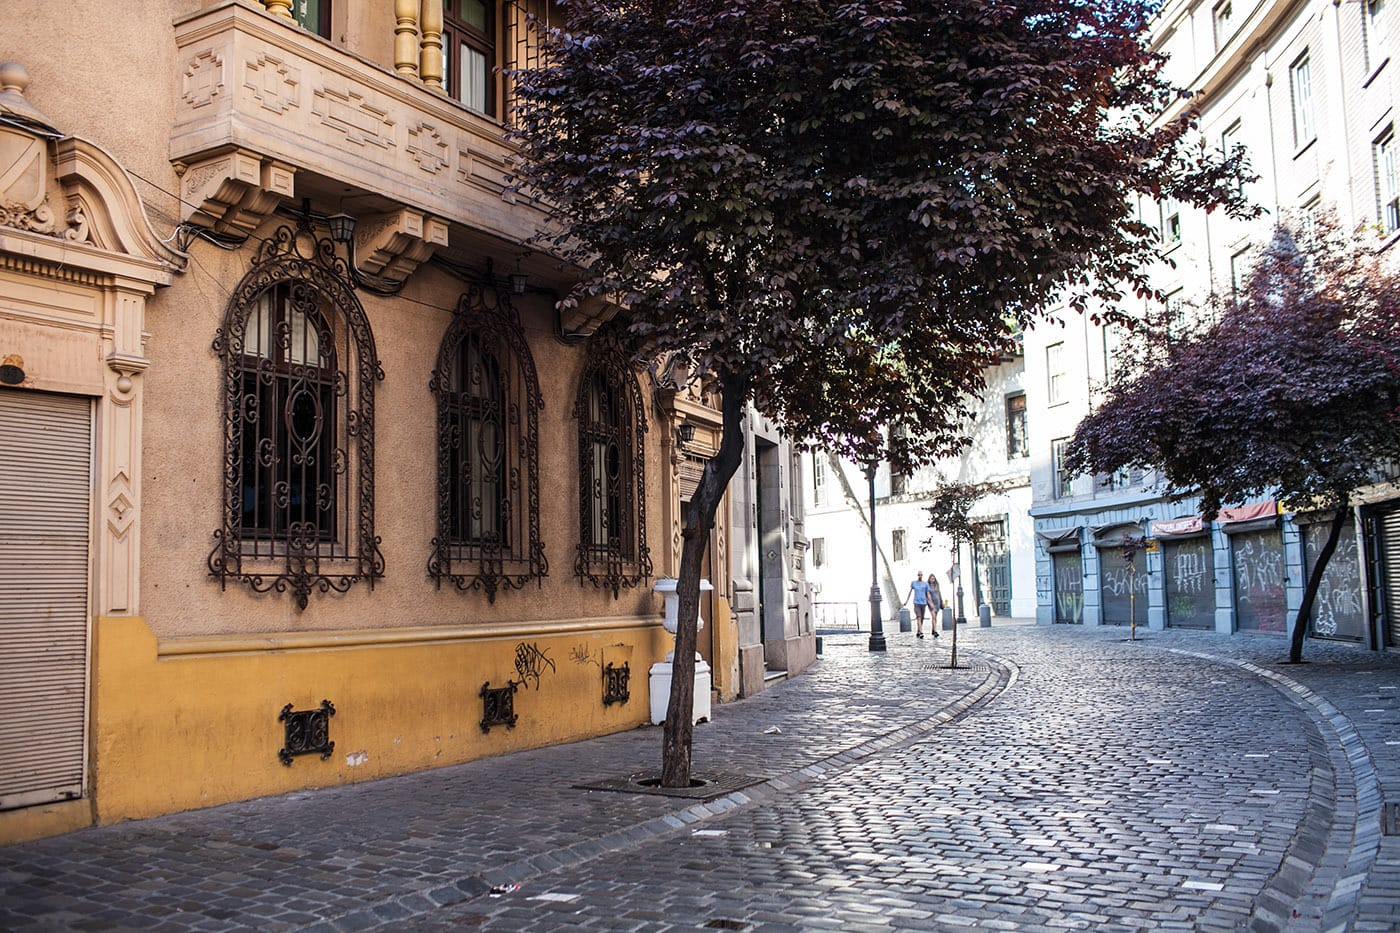 London Street in Santiago, Chile